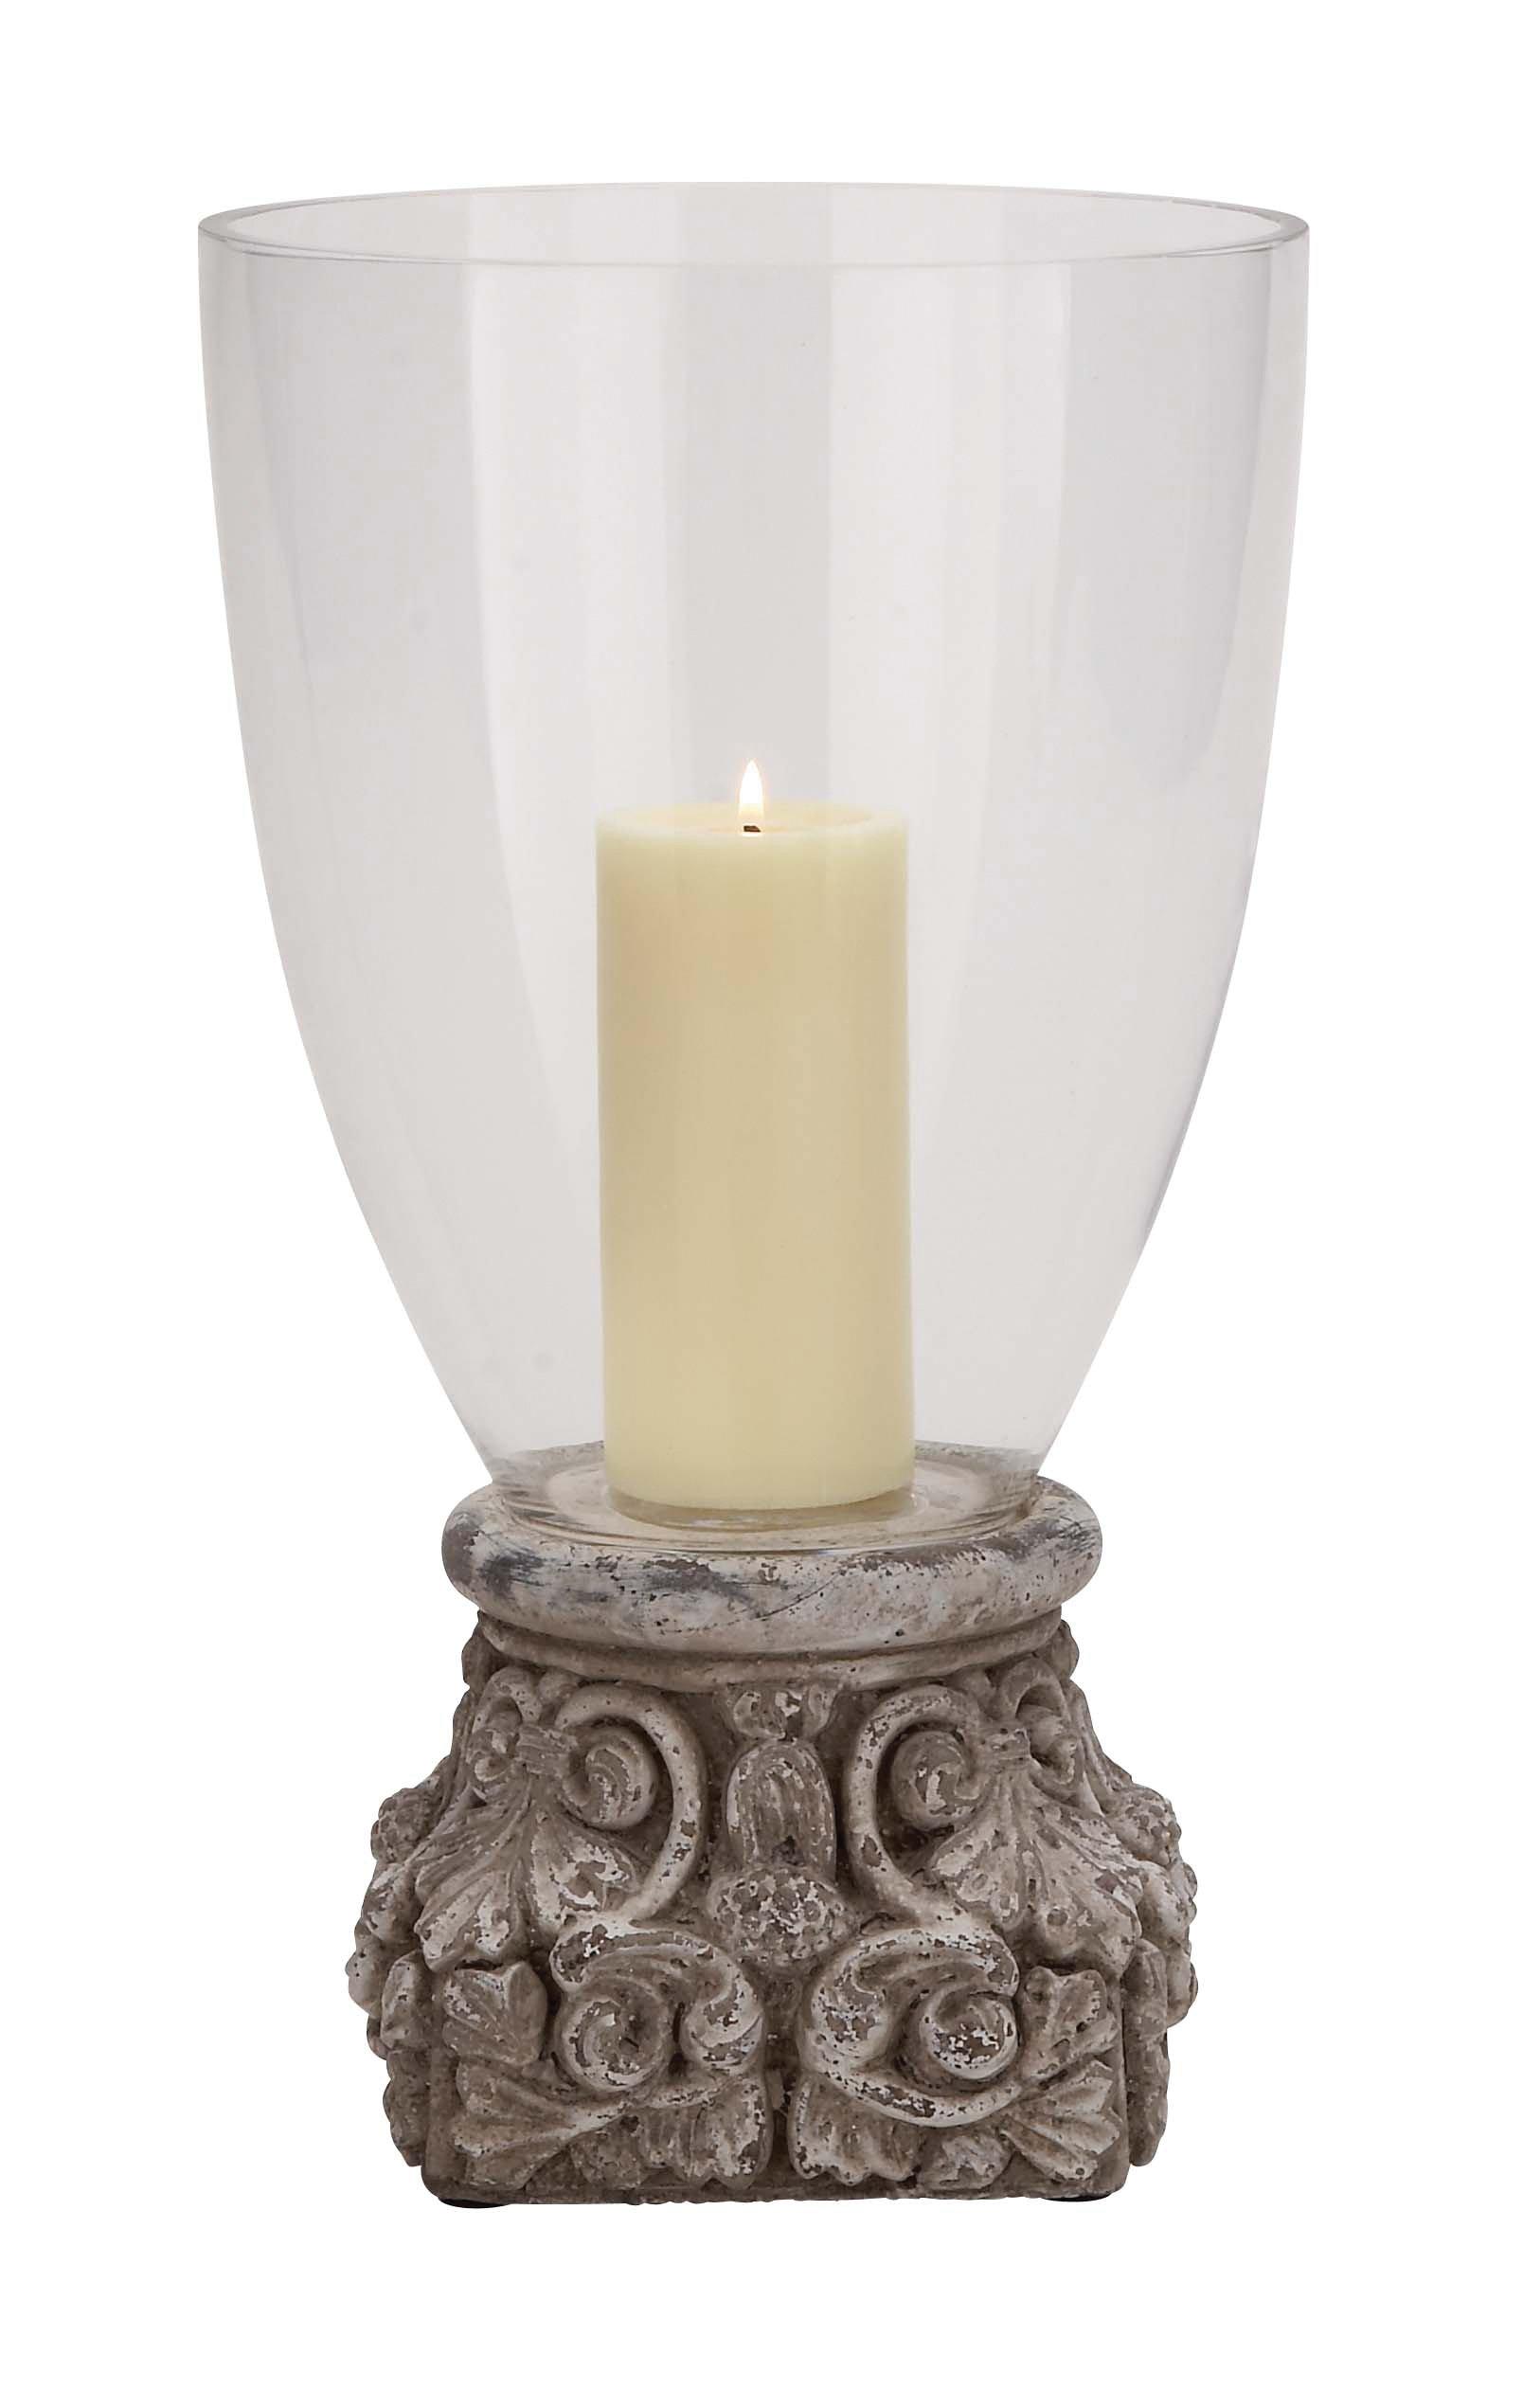 Benzara 38826 Enthralling Styled Terracotta Glass Hurricane